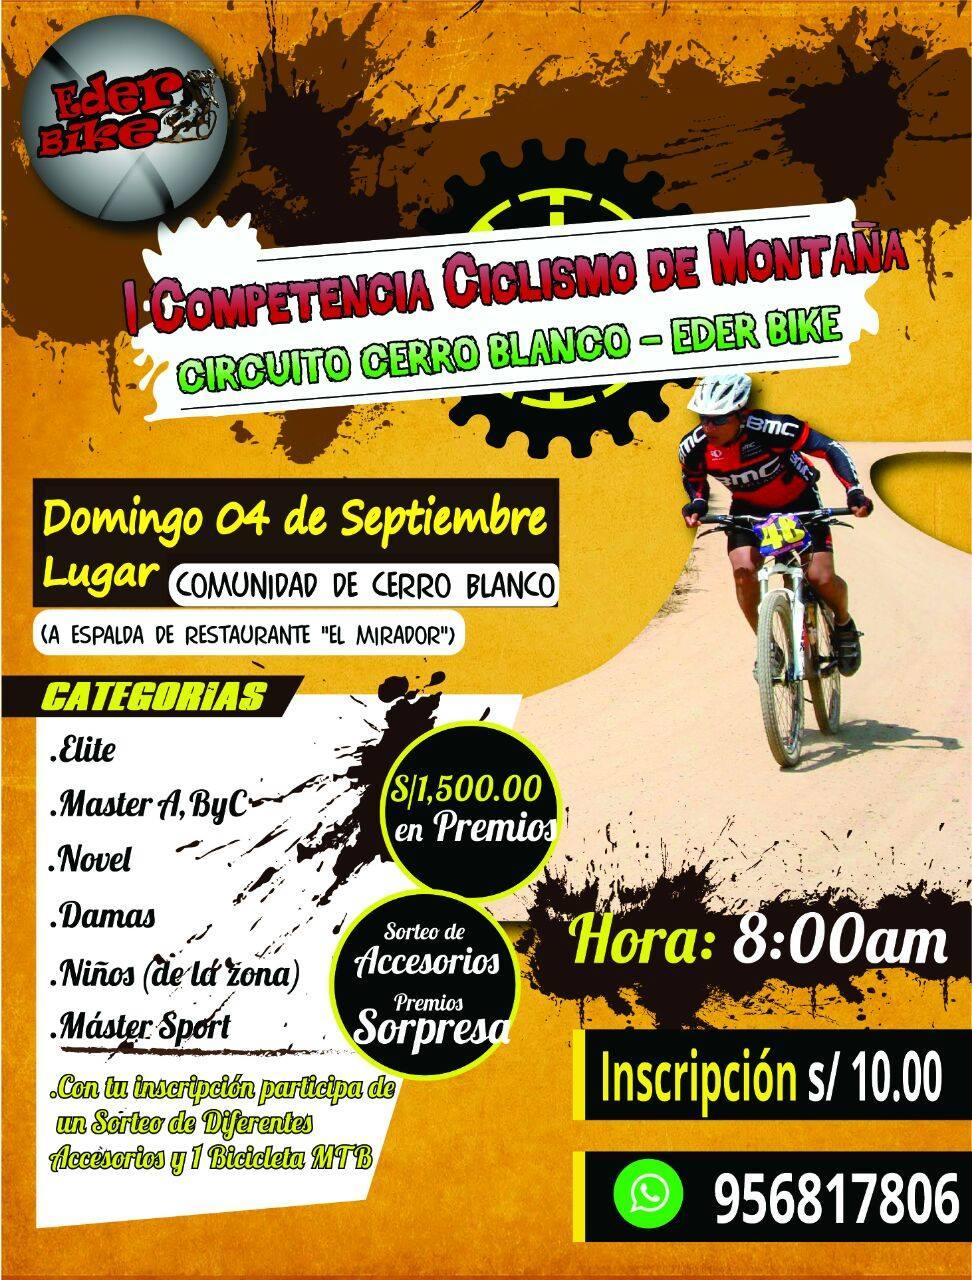 Circuito Xc : I competencia de ciclismo xc circuito cerro blanco club de